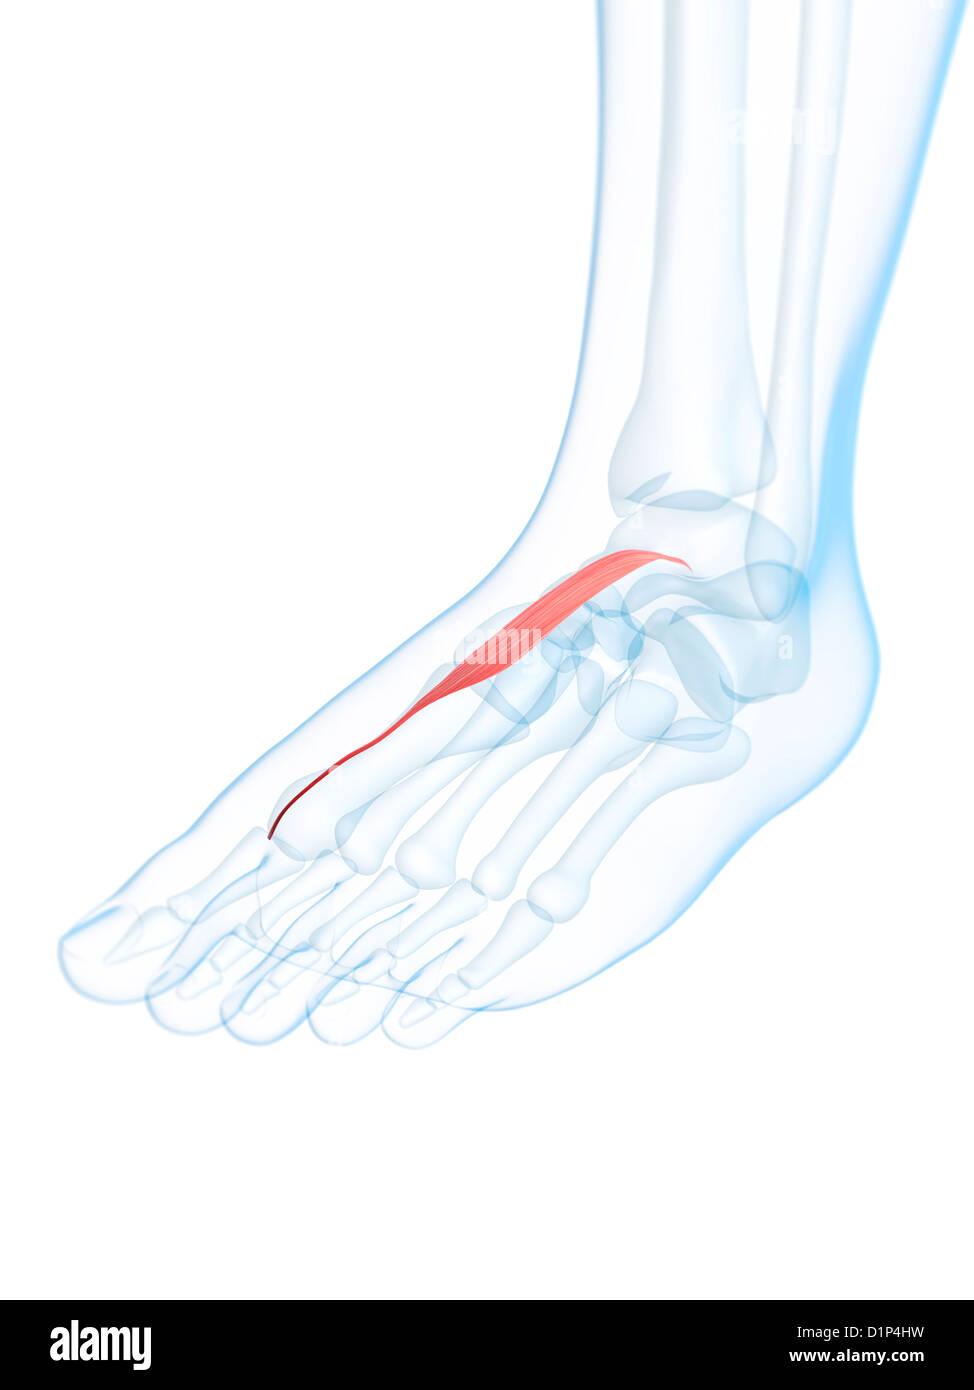 Human Muscle Foot Anatomy Stock Photos Human Muscle Foot Anatomy